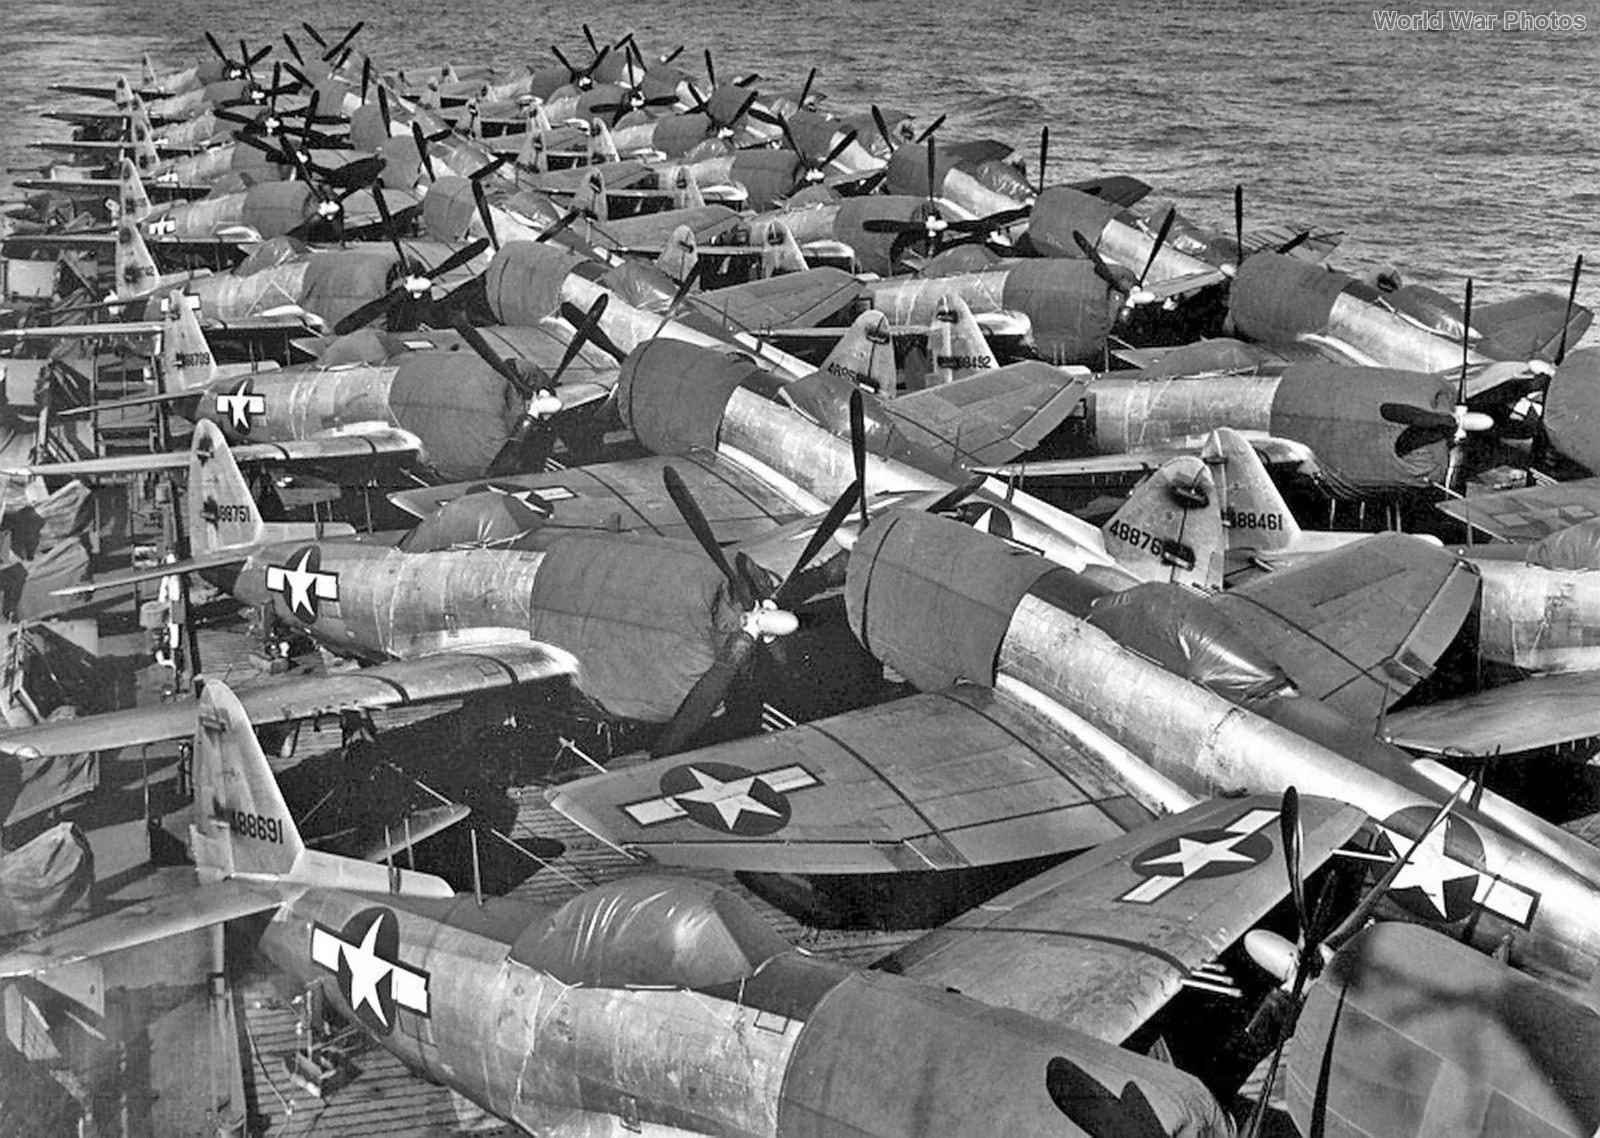 P-47N on the flight deck of Casablanca 16 July 1945